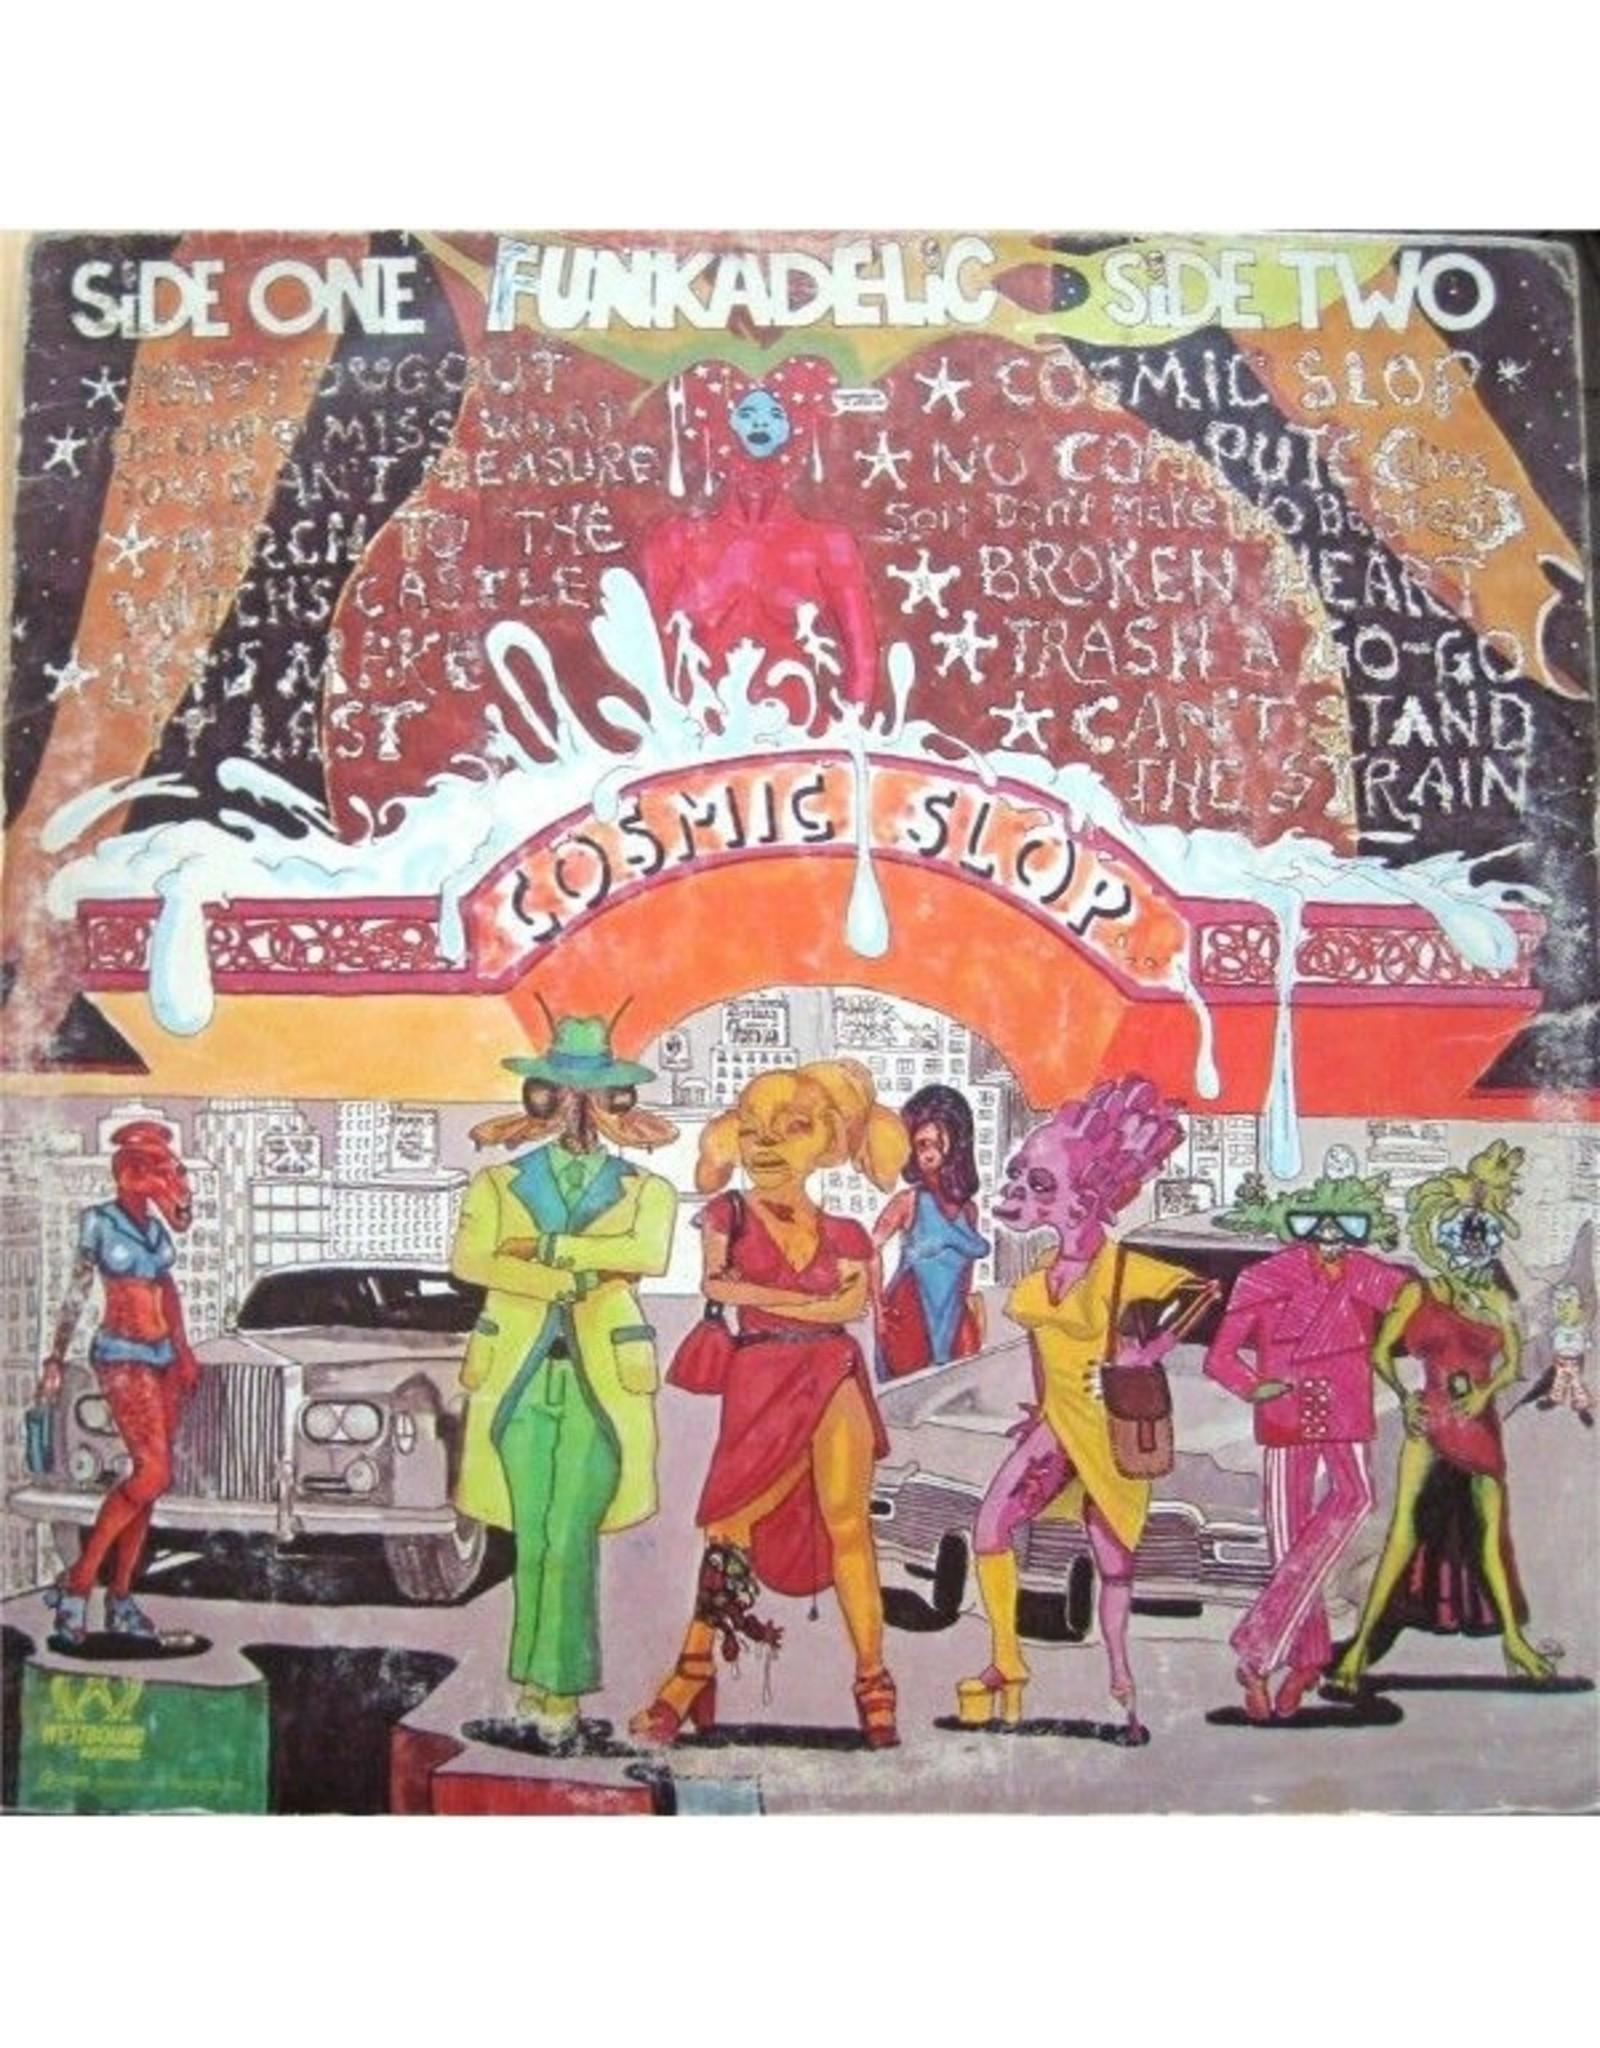 Funkadelic - Cosmic Slop (Gold Vinyl)